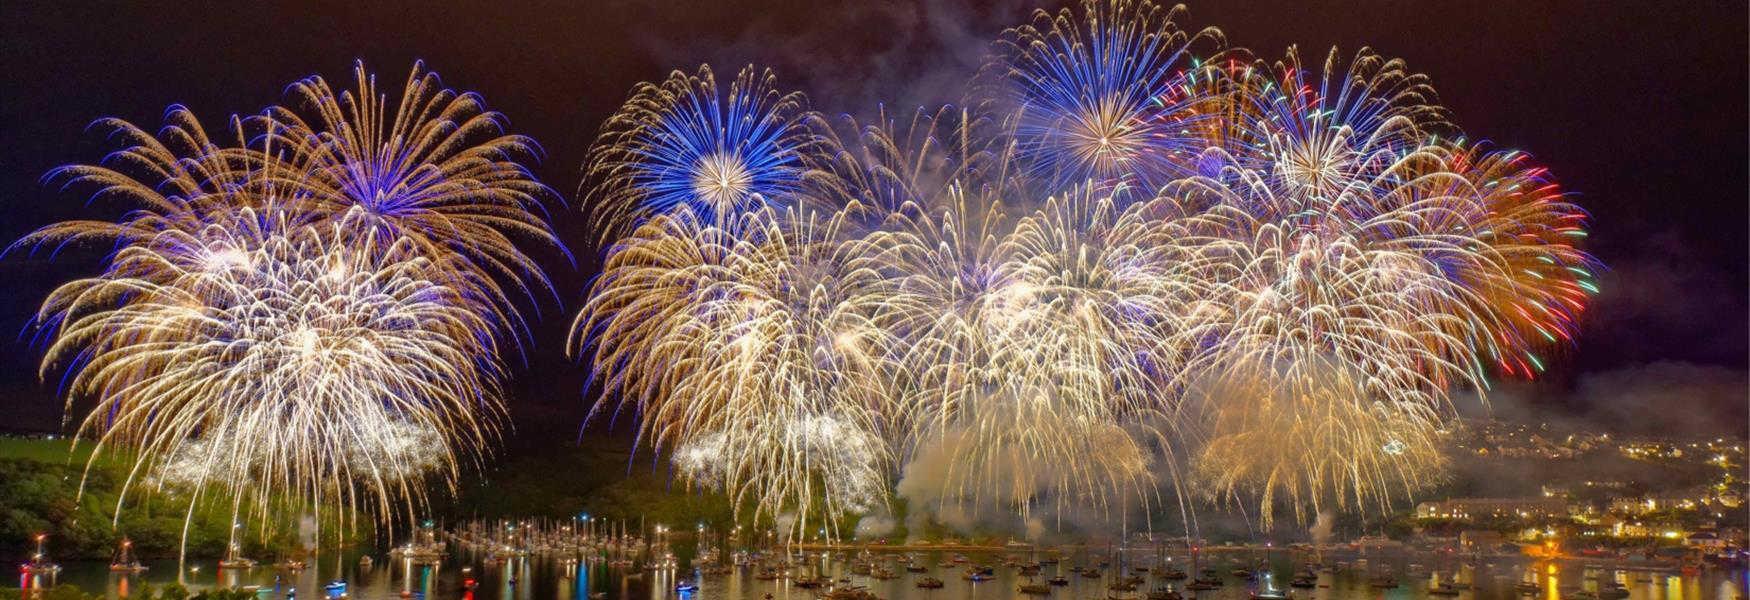 Regatta Fireworks - (c) richlawnphoto.com